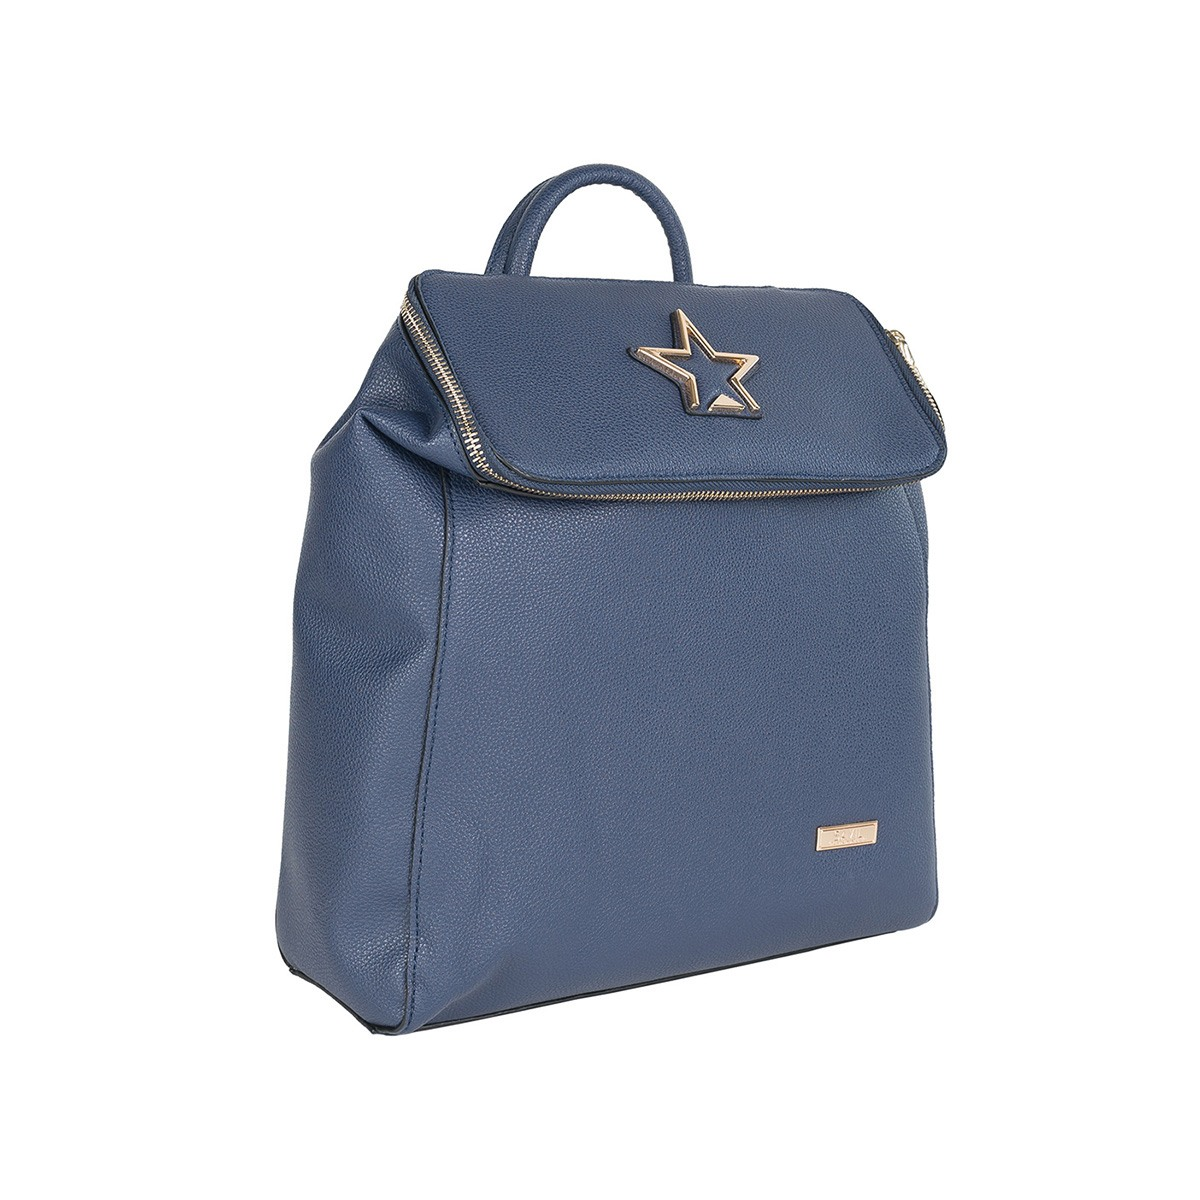 1acc070e83 Προσφορά Σακίδιο Πλάτης Με Αστέρι Savil Backpack 18-67 Μπλε